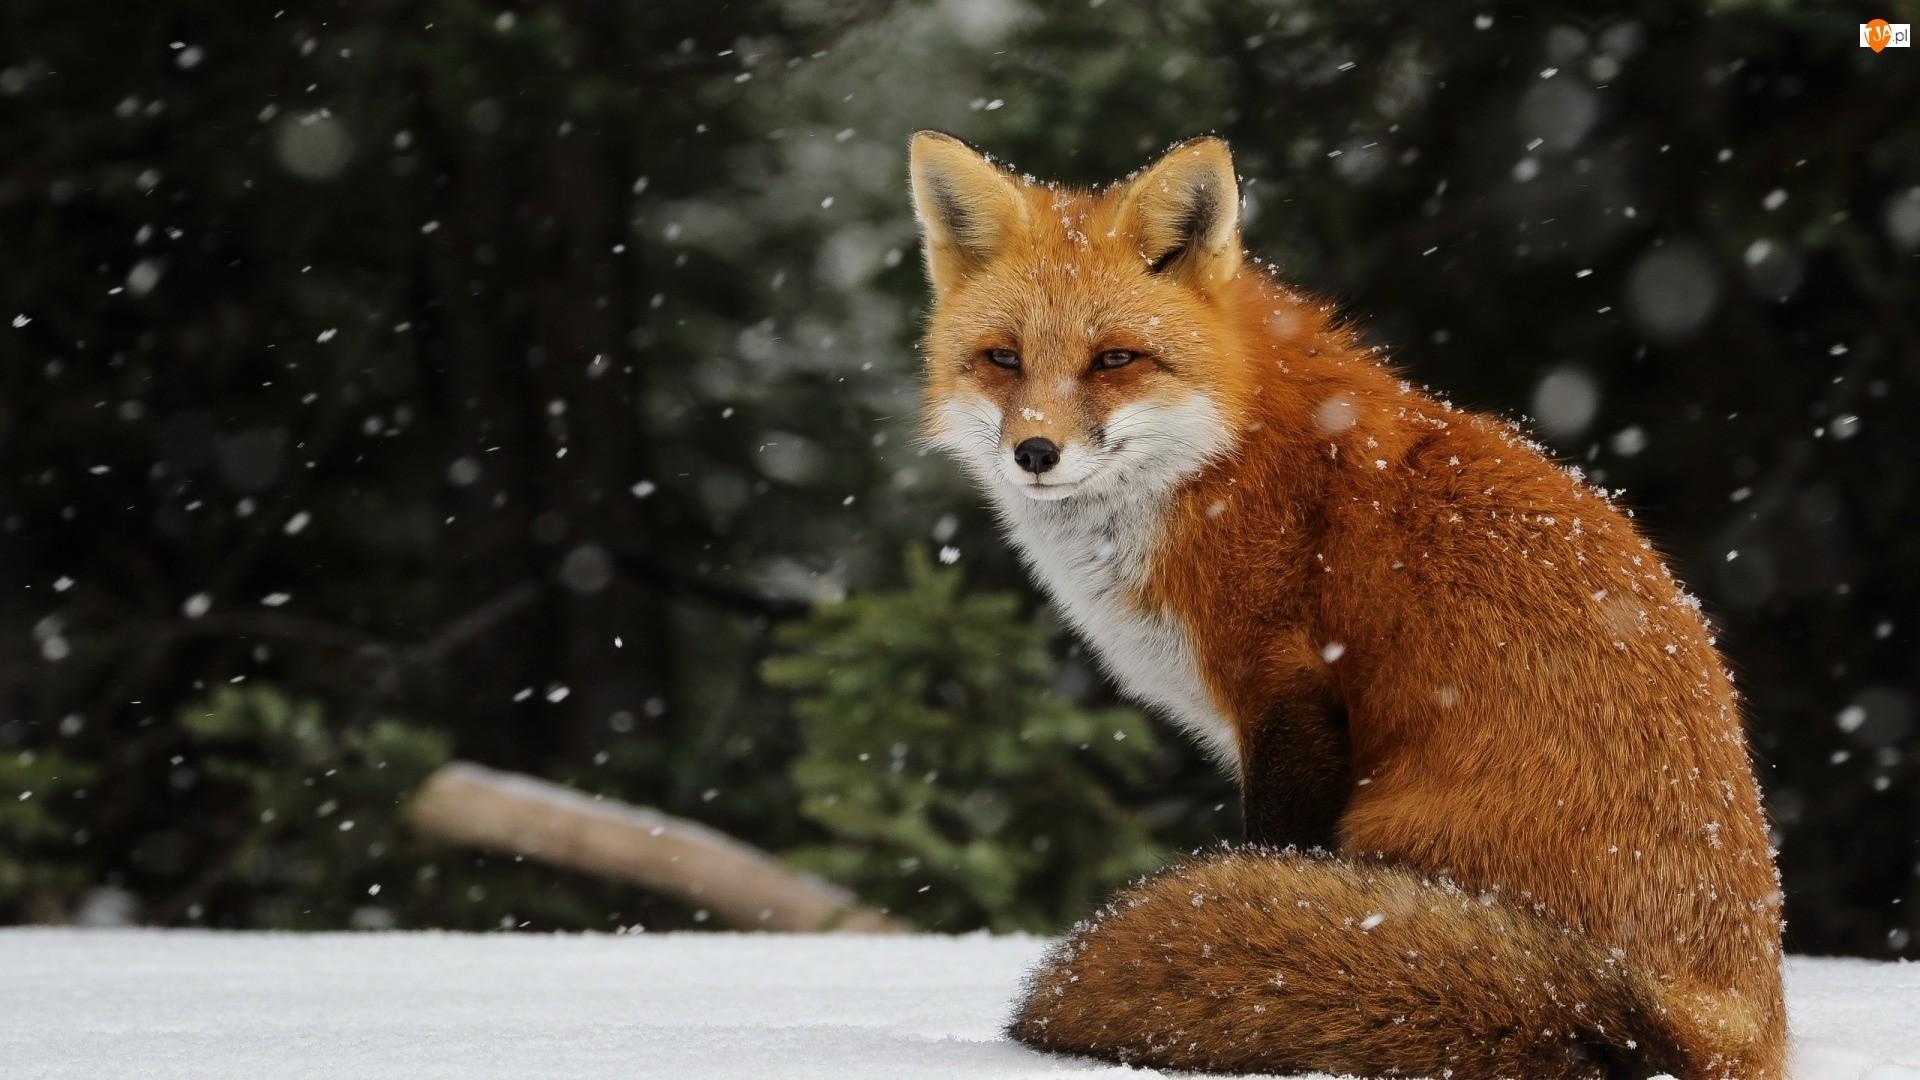 Fox hd wallpaper download